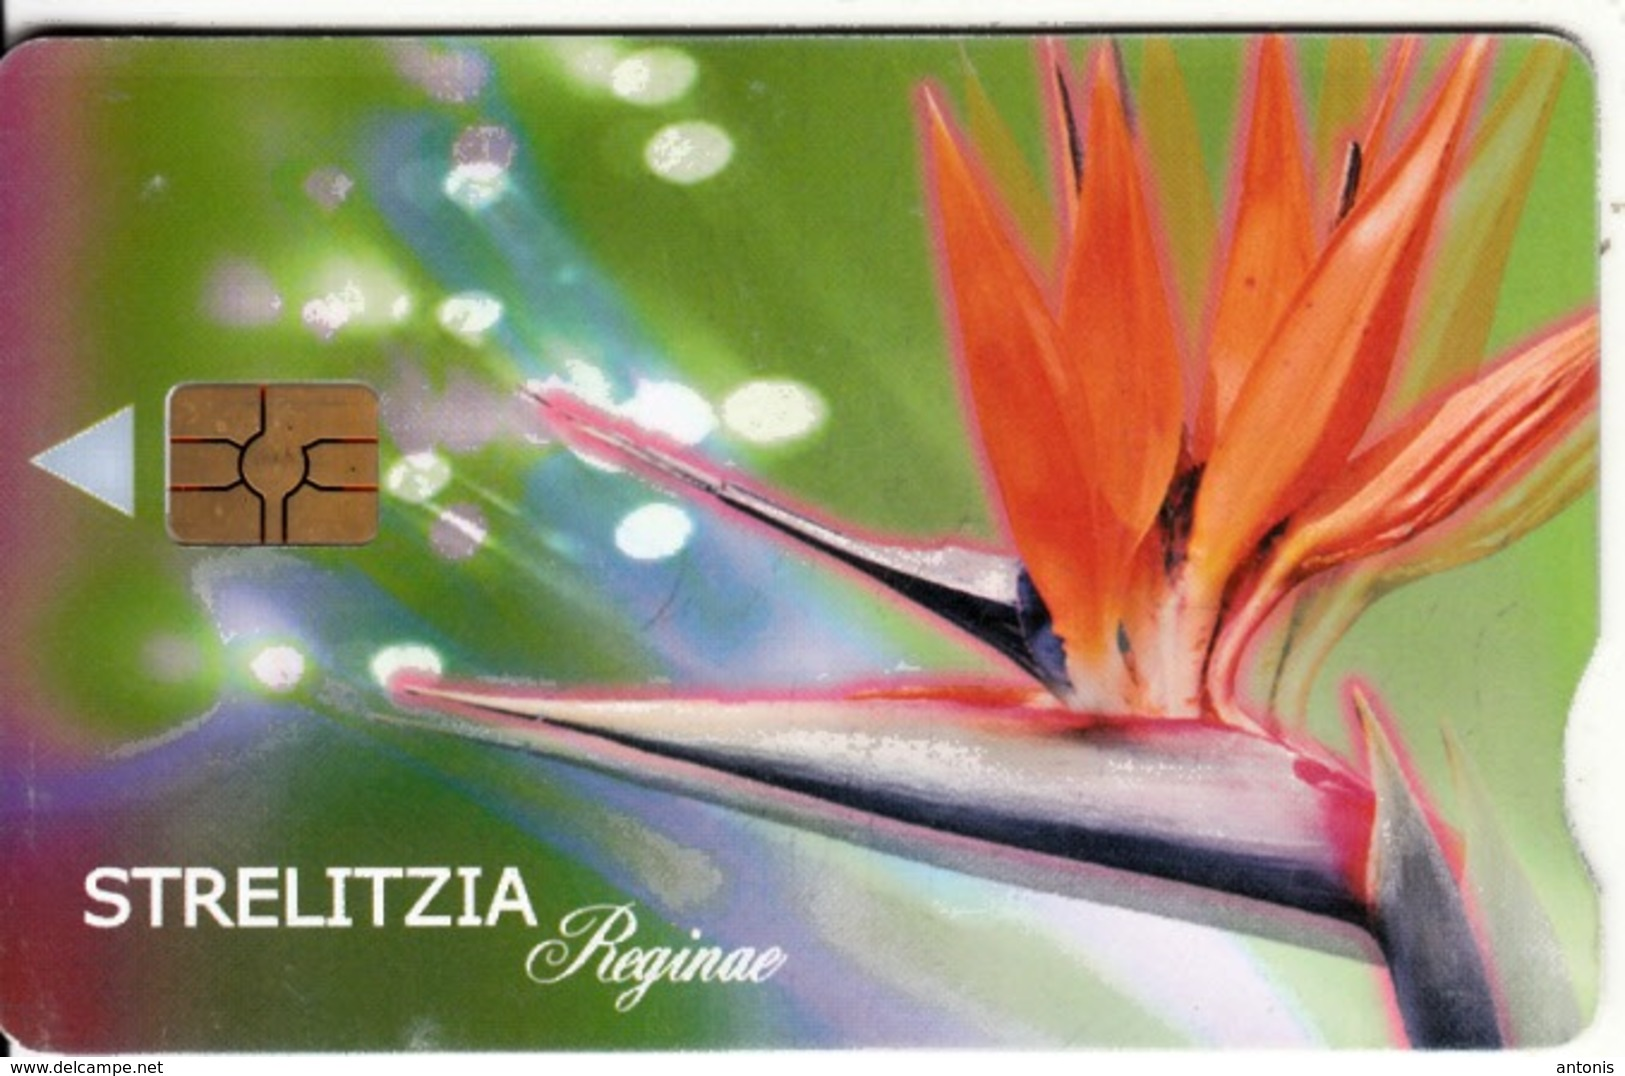 SOUTH AFRICA - Flower, Strelitzia, Telkom Telecard, Chip GEM3.3, Exp.date 05/02, Used - Afrique Du Sud